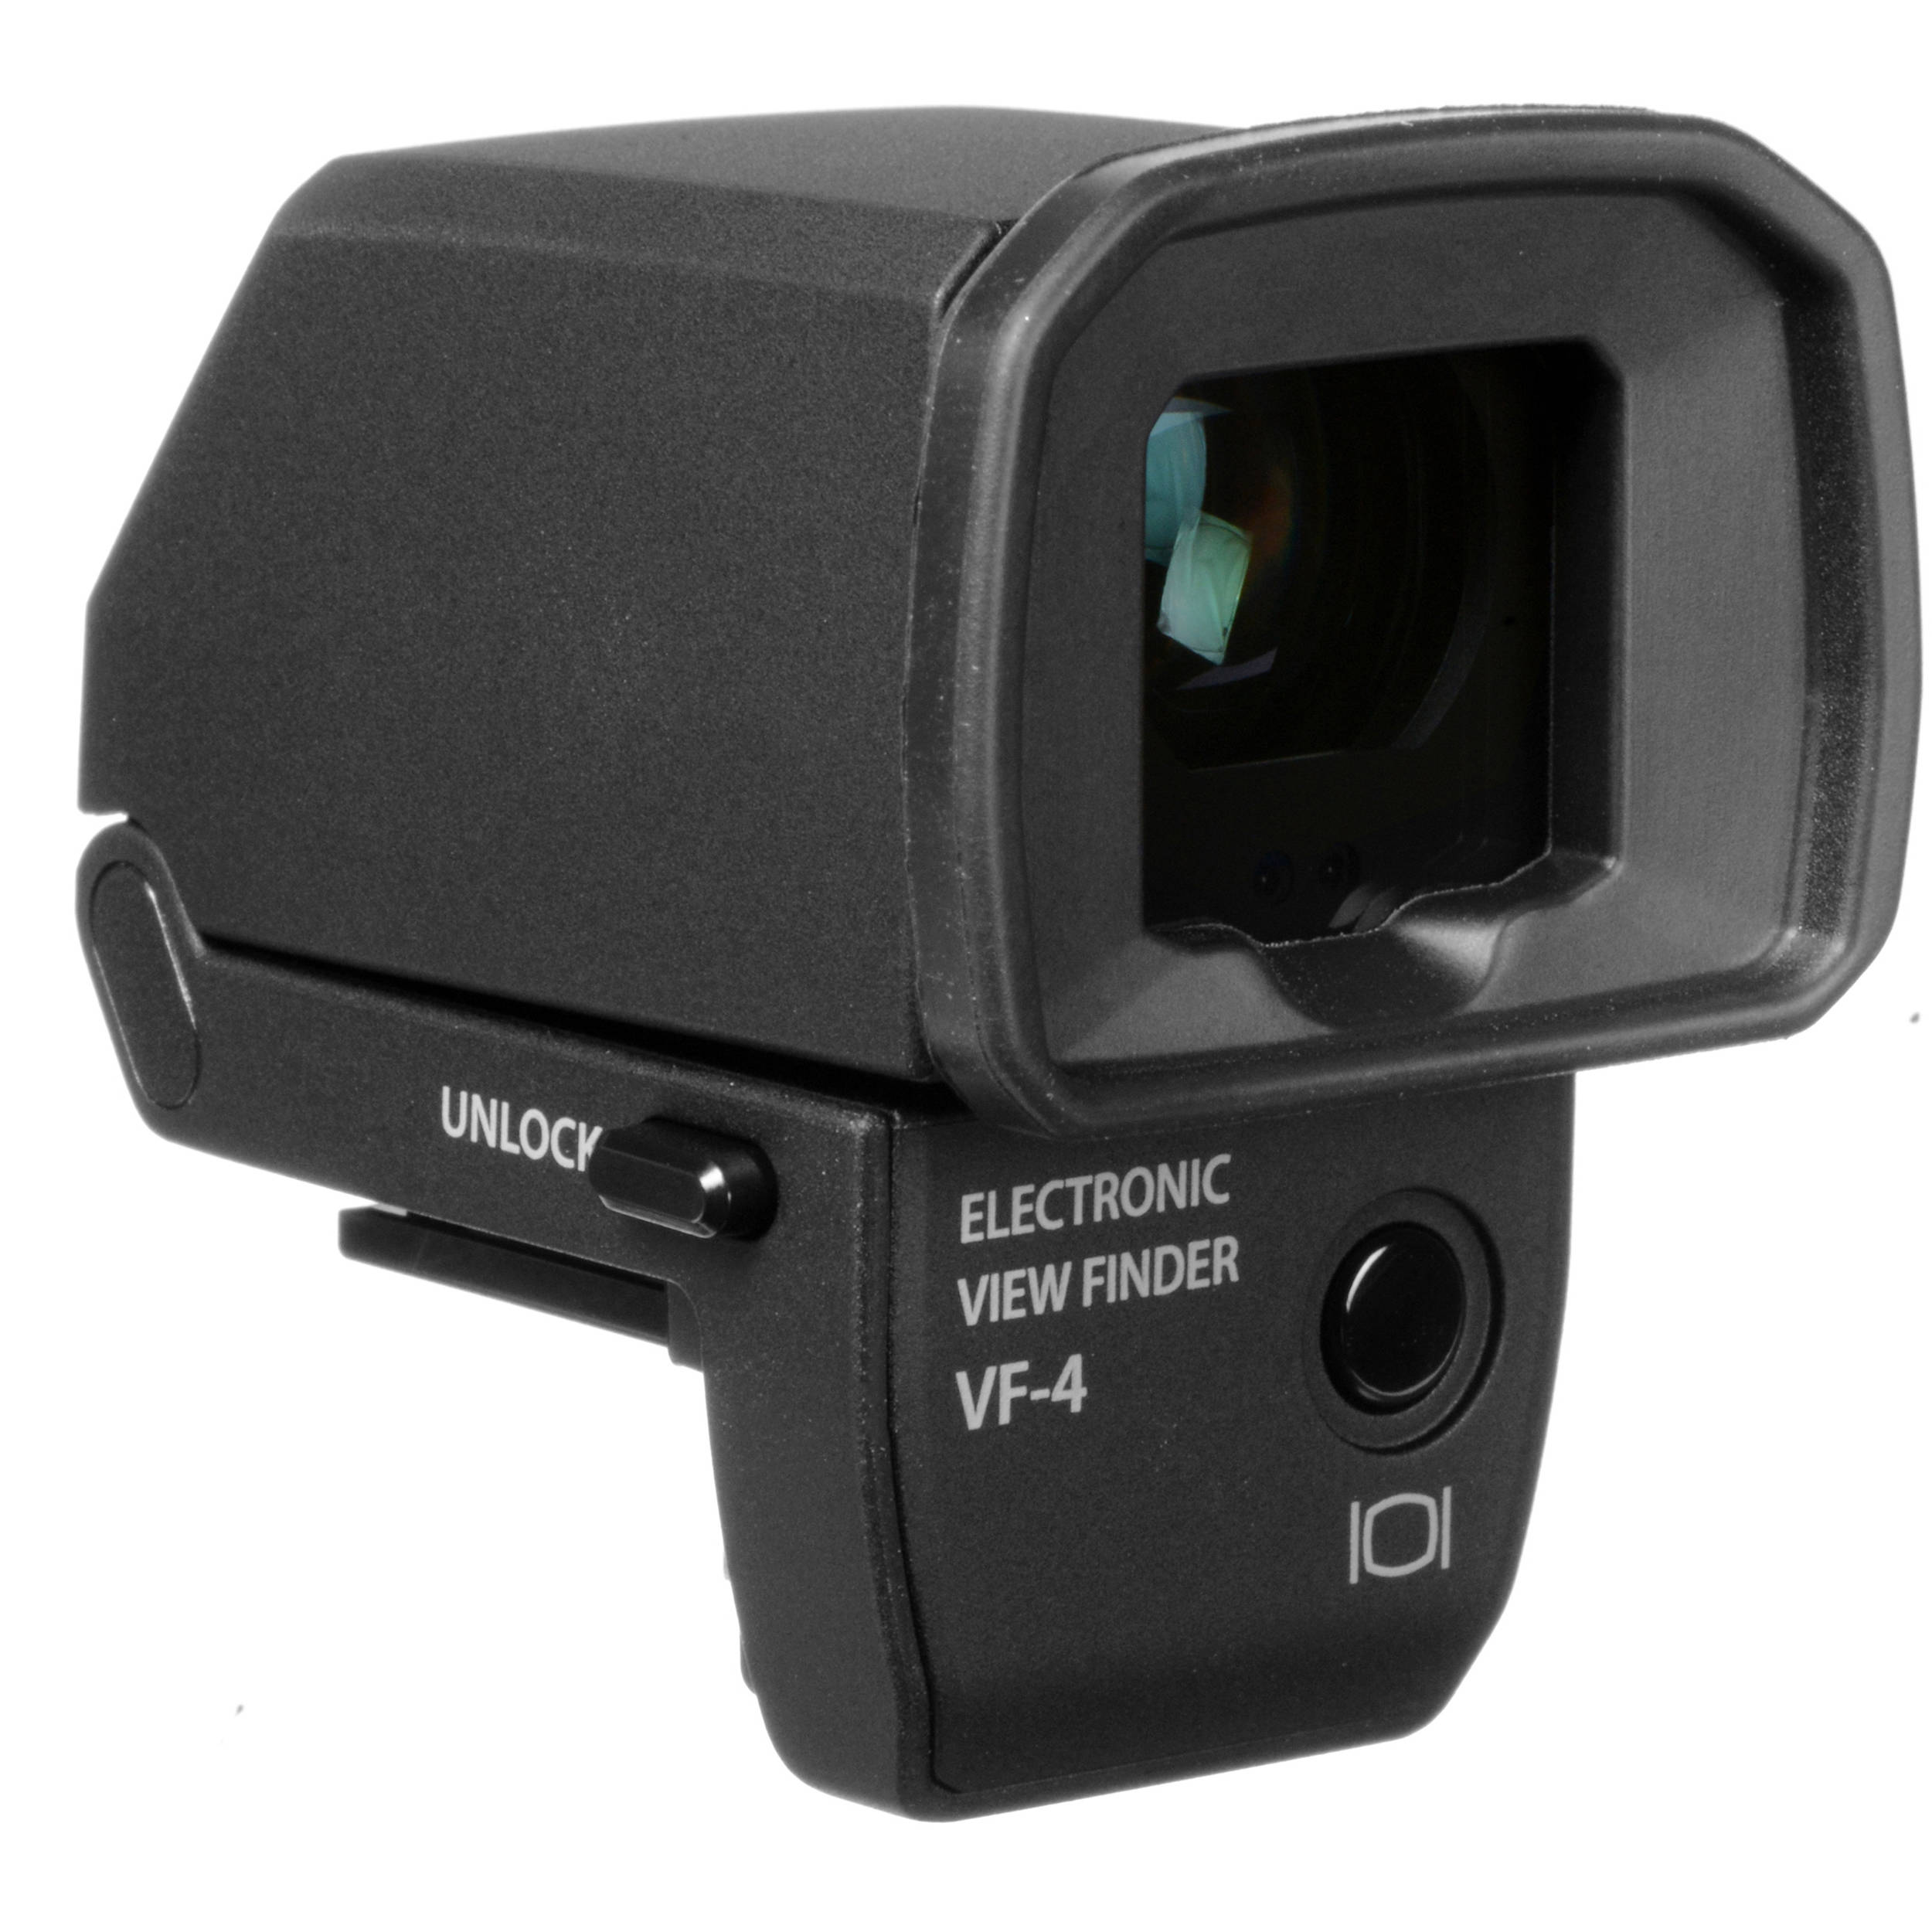 Black Olympus VF-2 Electronic ViewFinder